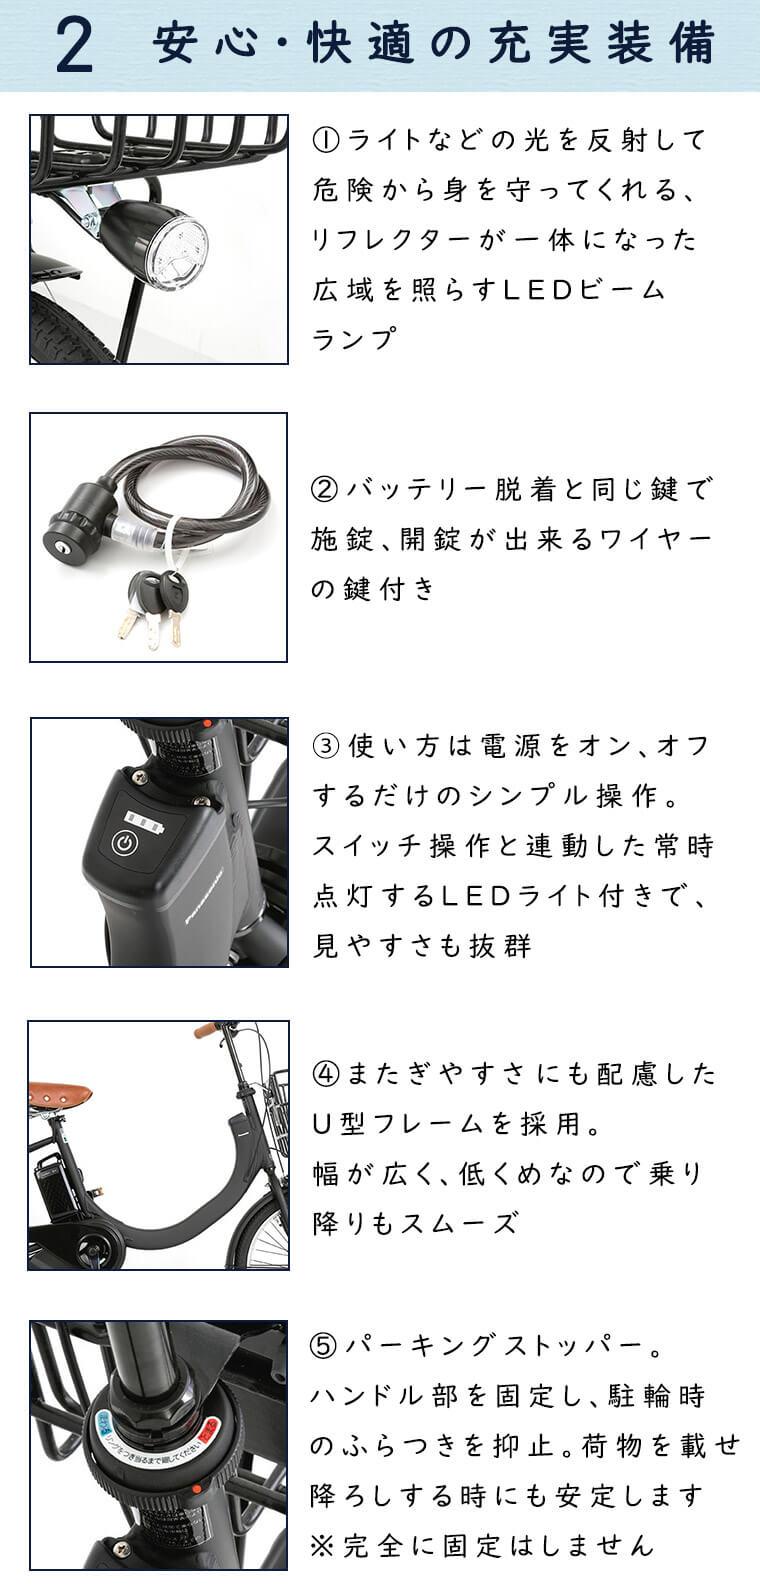 PanasonicのSWの電動自転車の装備